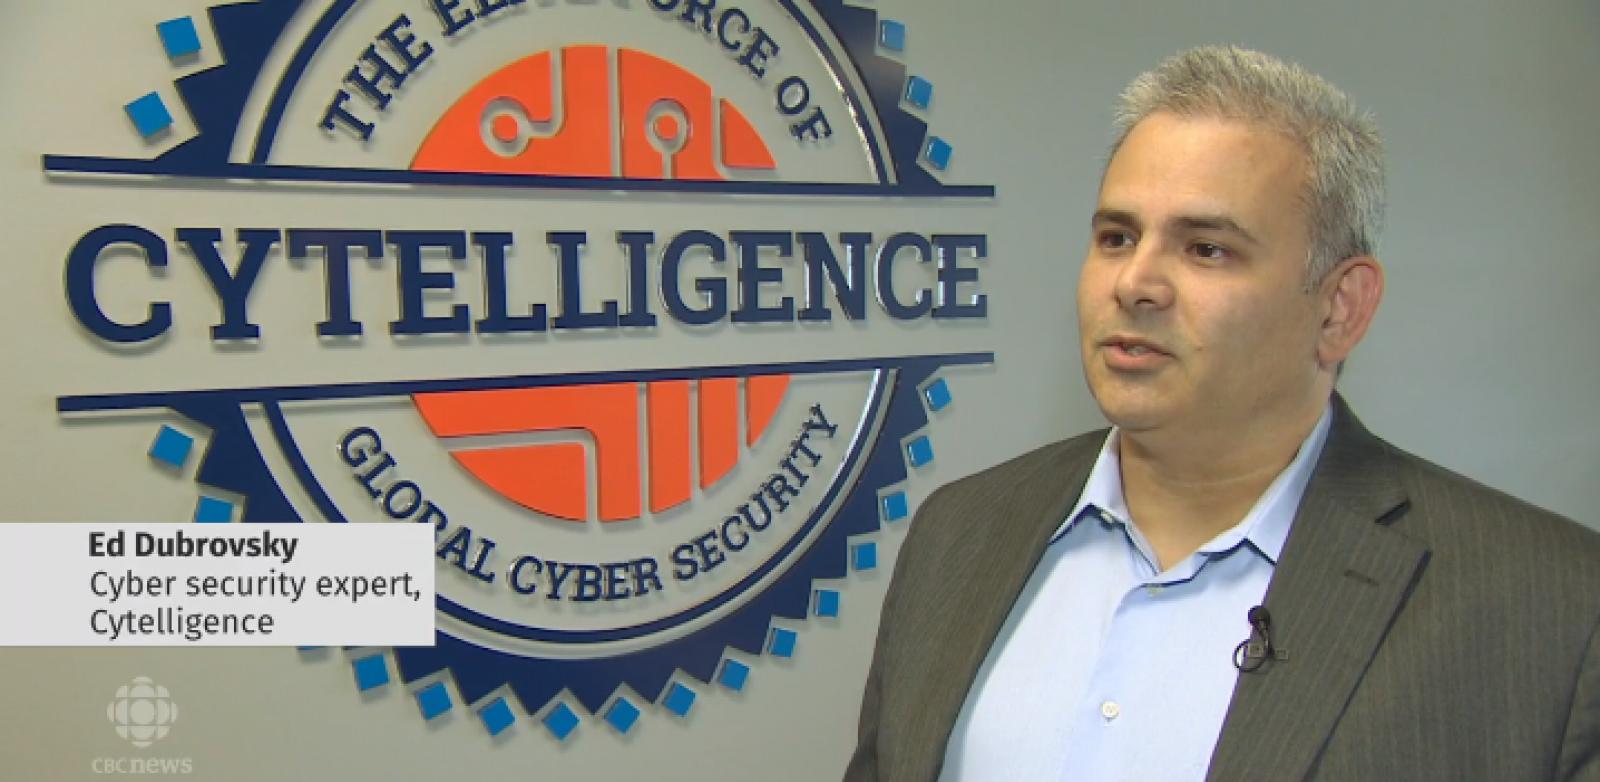 Ed Dubrovsky - Cyber Security Program Instructor